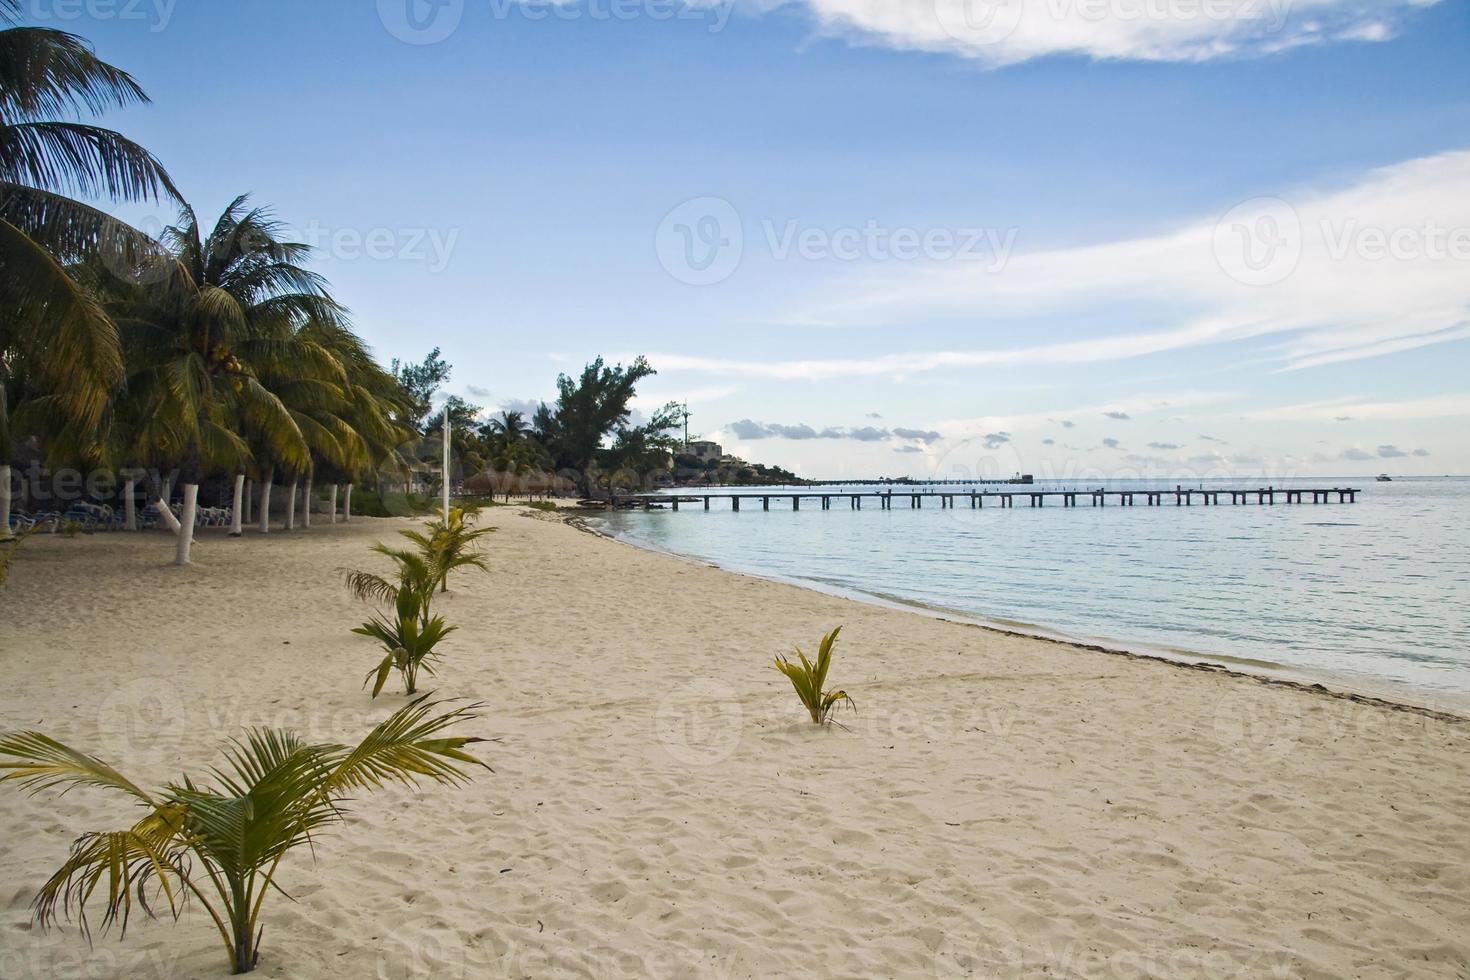 playa lancheros, isla mujeres, méxico photo